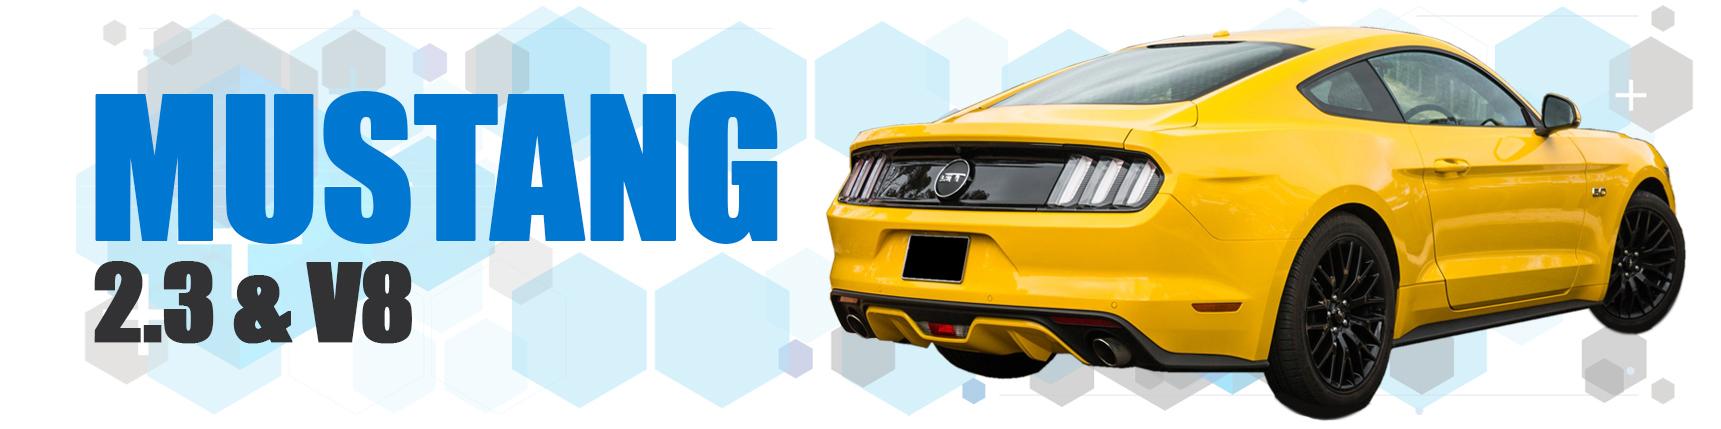 Mustang 2015 2.3 EcoBoost & V8